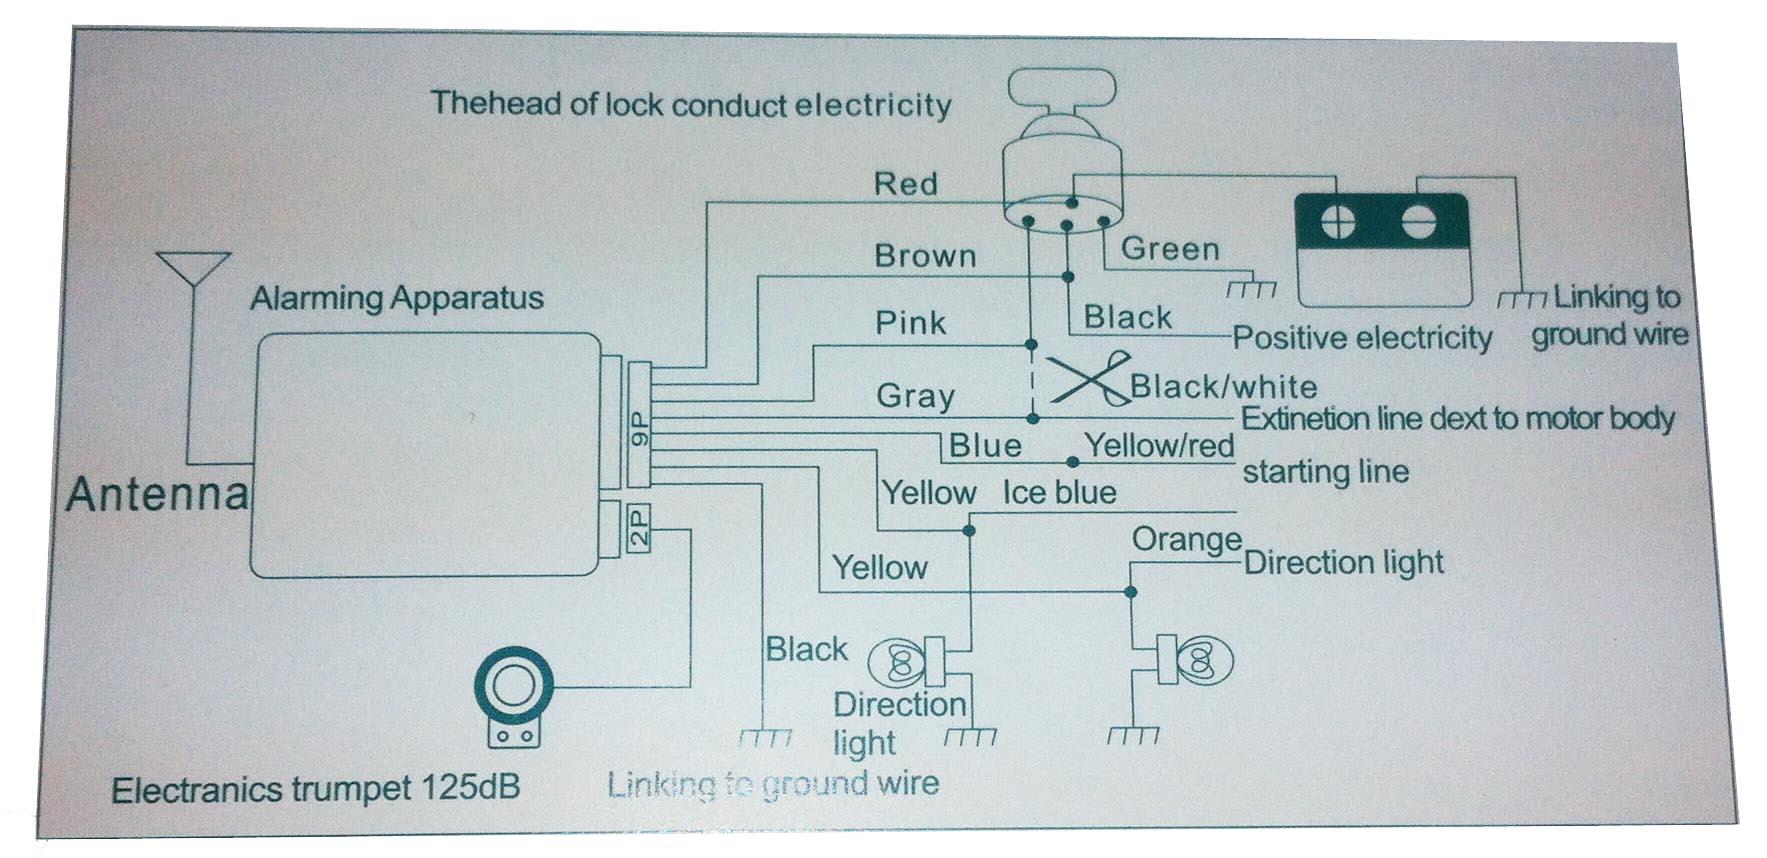 Beret Car Alarm Wiring Diagram : Beret car alarm wiring diagram thermostat